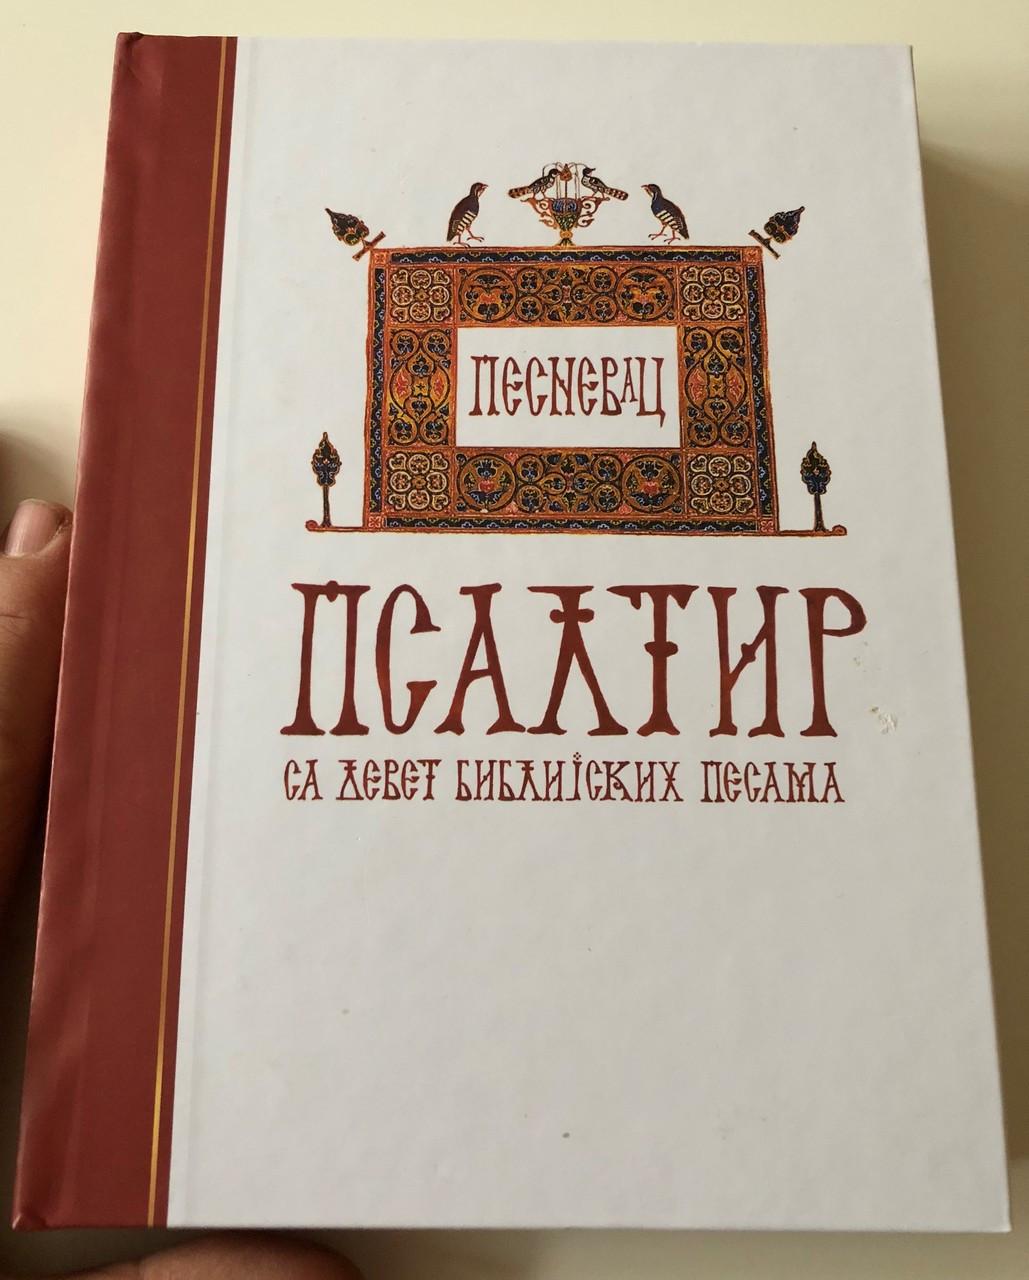 Serbian Psalm Book with 9 Biblical Songs / Greek and Slovenian Orthodox  Psalters / + Bshp Atanasije / 2nd edition / Псалтир - Psaltir sa 9